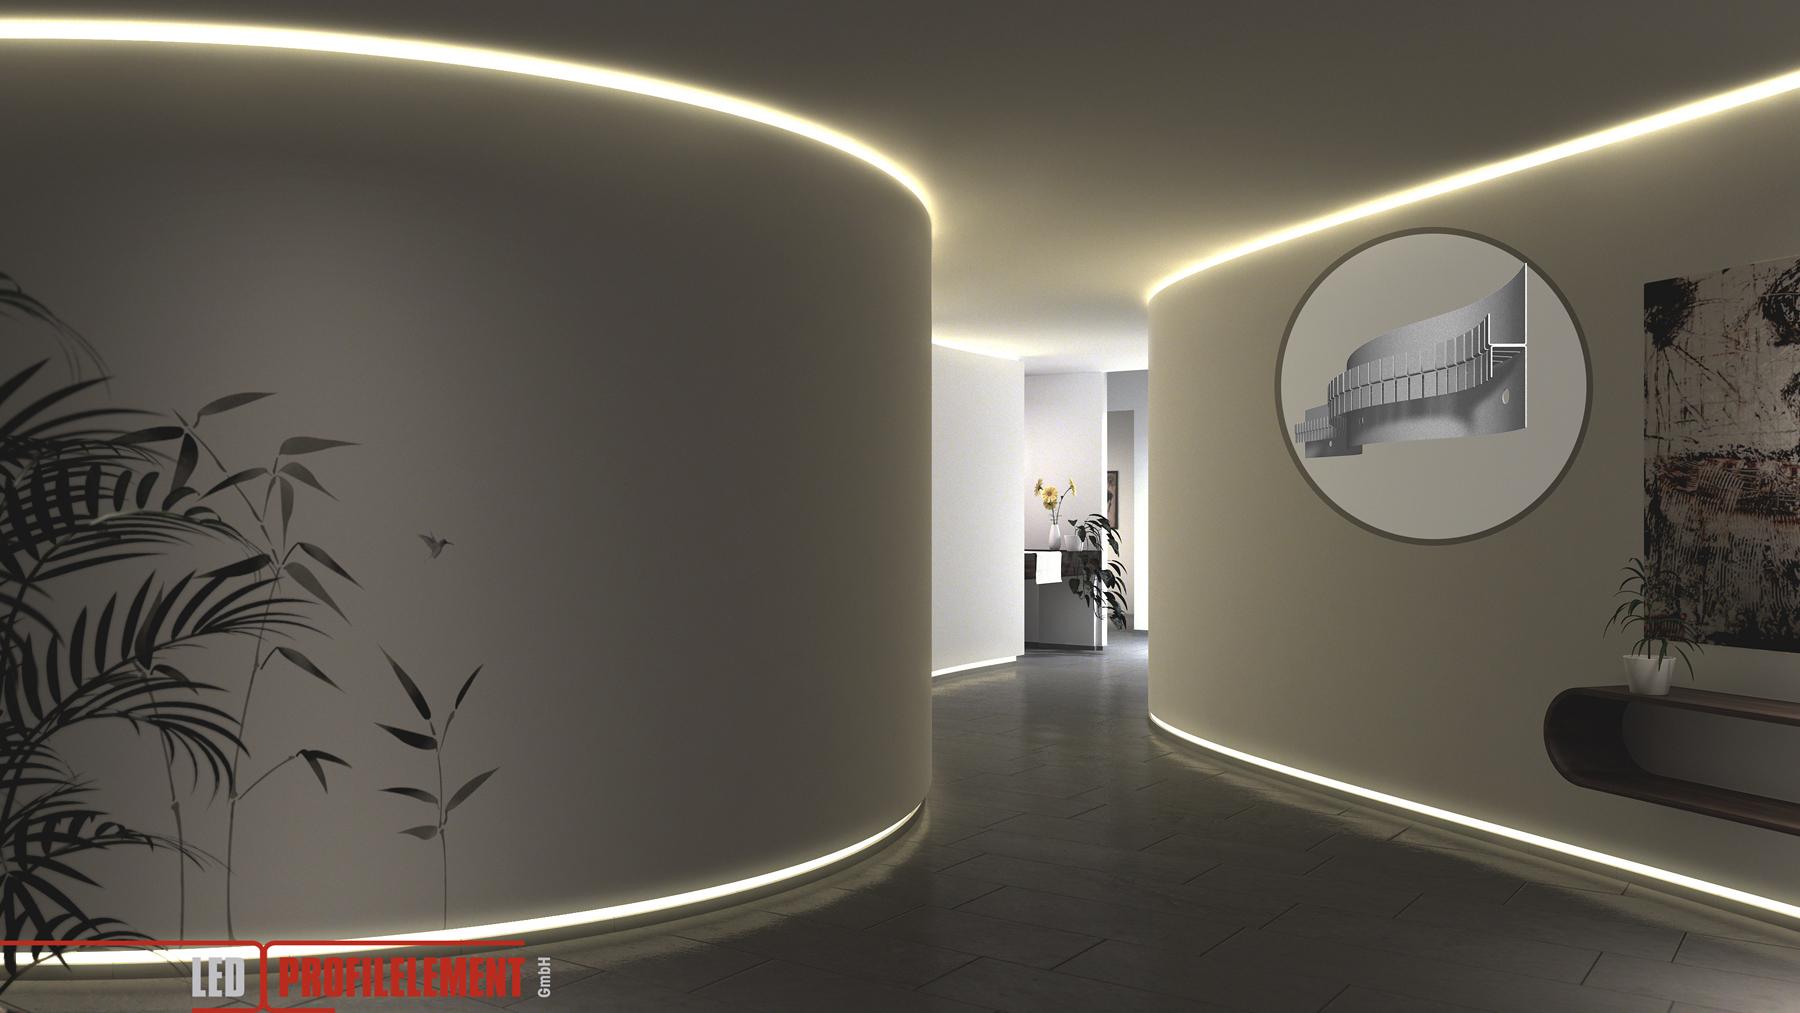 hera lighting uk burcridge ltd led profile element. Black Bedroom Furniture Sets. Home Design Ideas